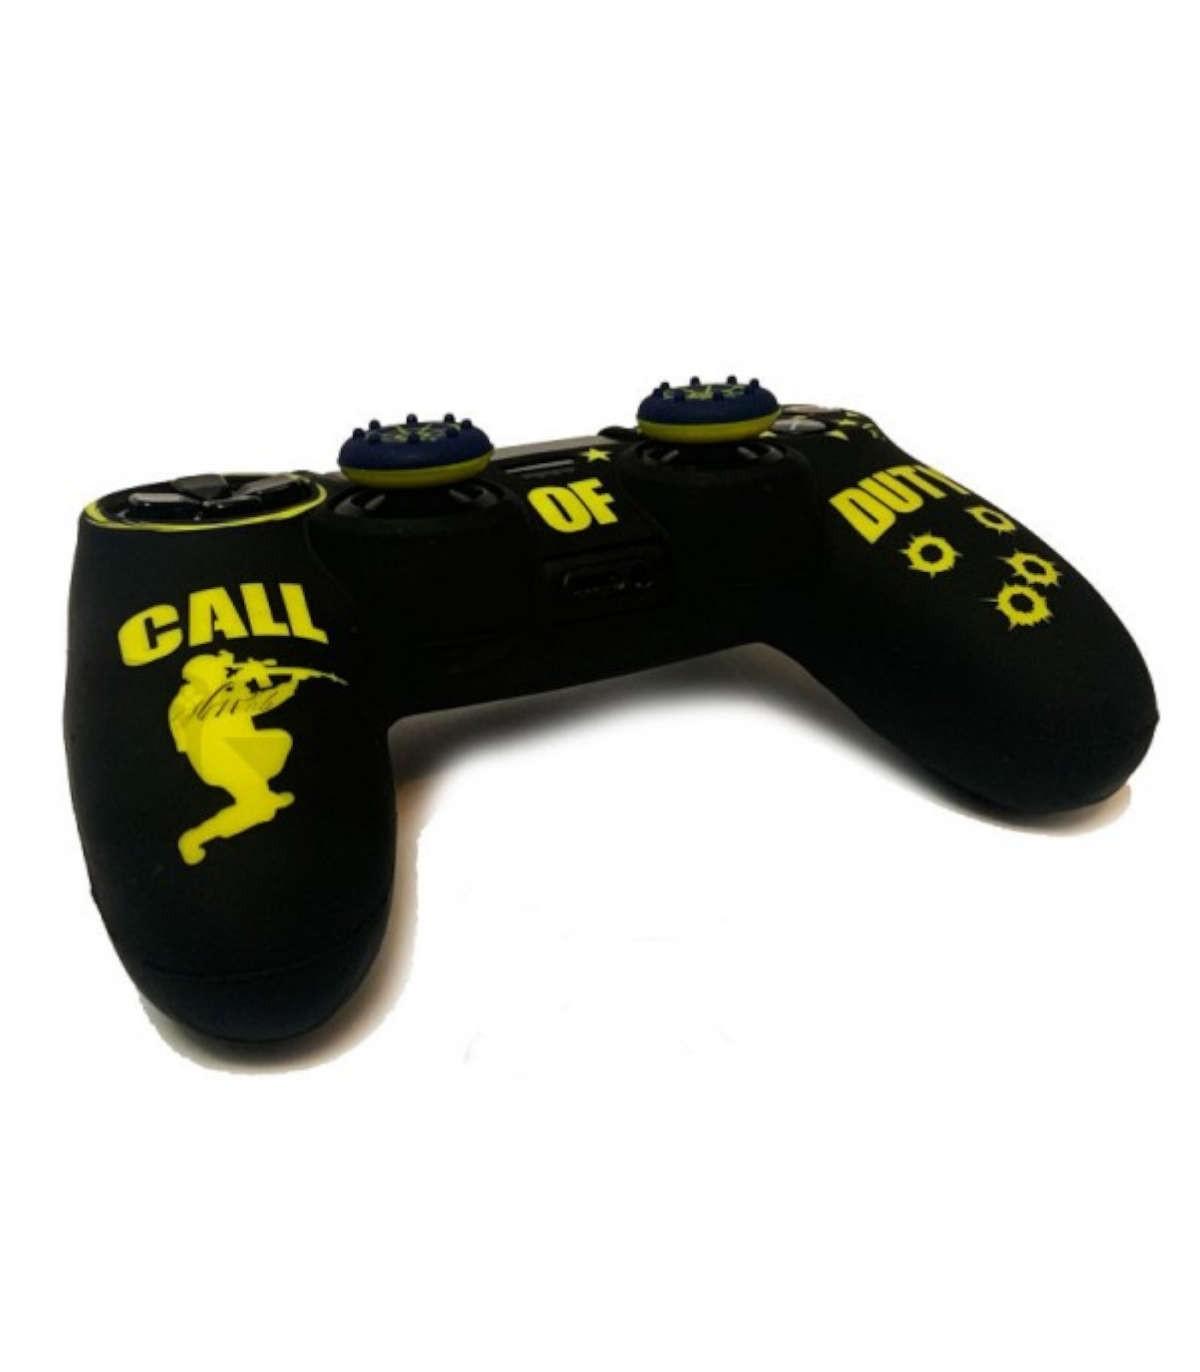 روکش دسته پلی استیشن 4 مدل Call Of Duty همراه با ۲ عدد محافظ